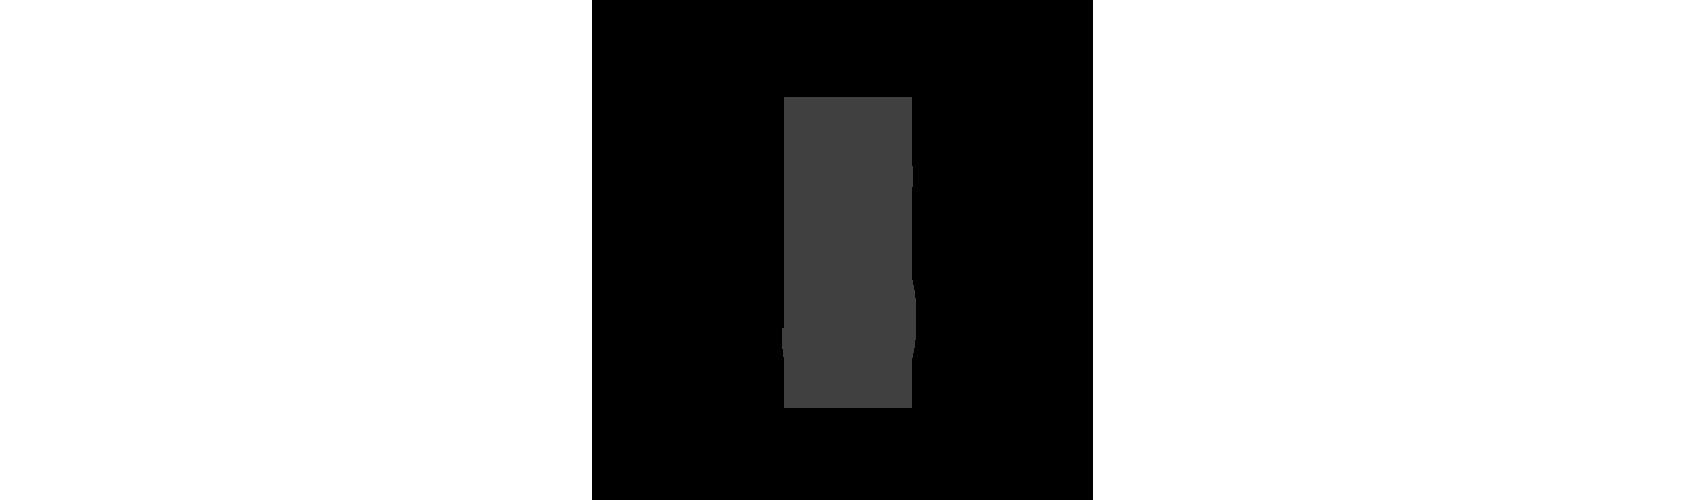 Circle 3 (Medium).png